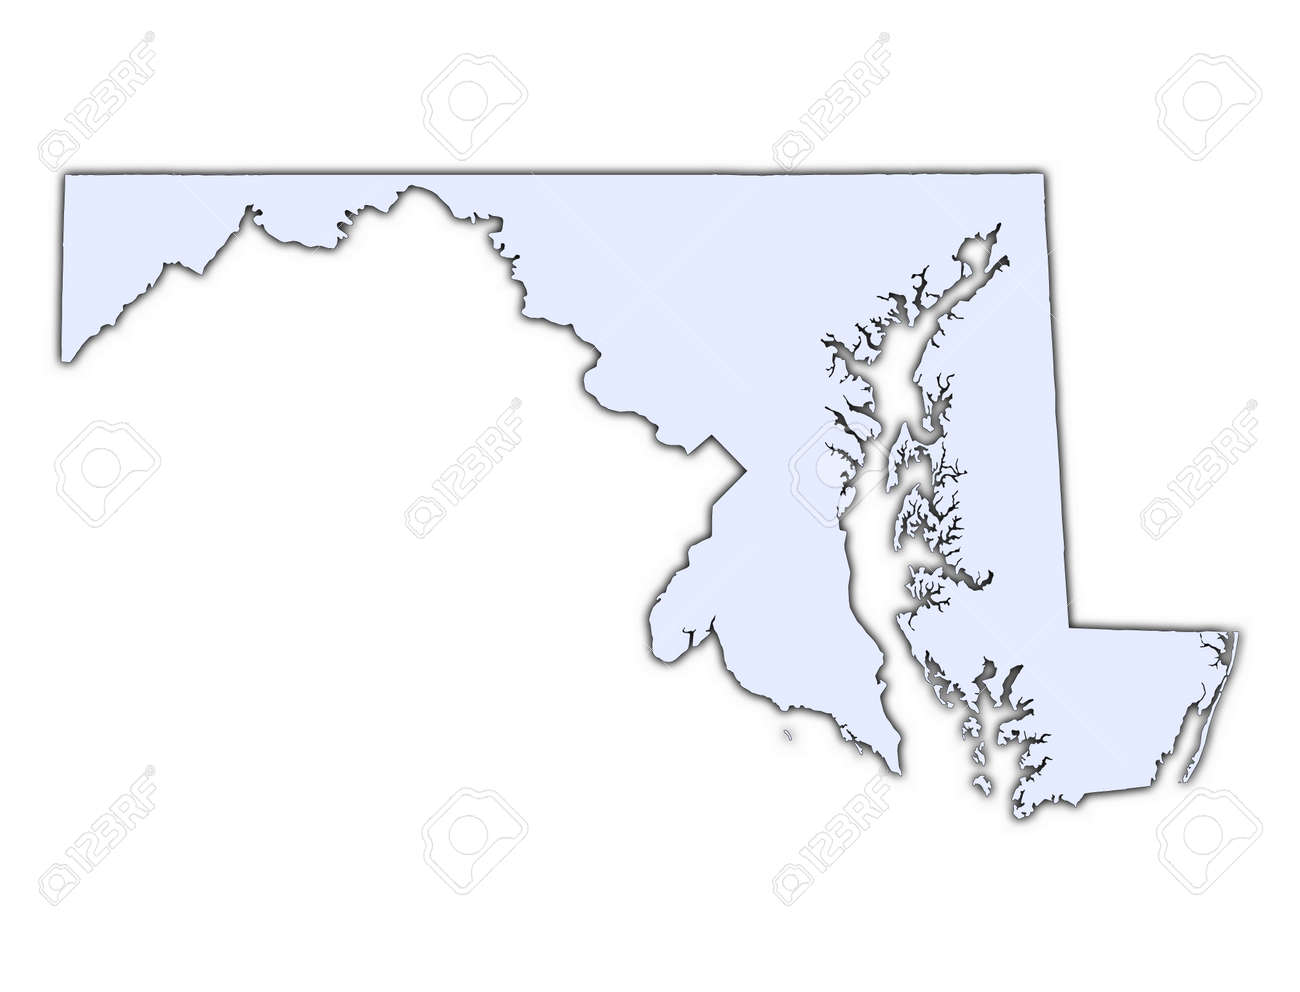 Maryland USA Light Blue Map With Shadow High Resolution - Map of maryland usa